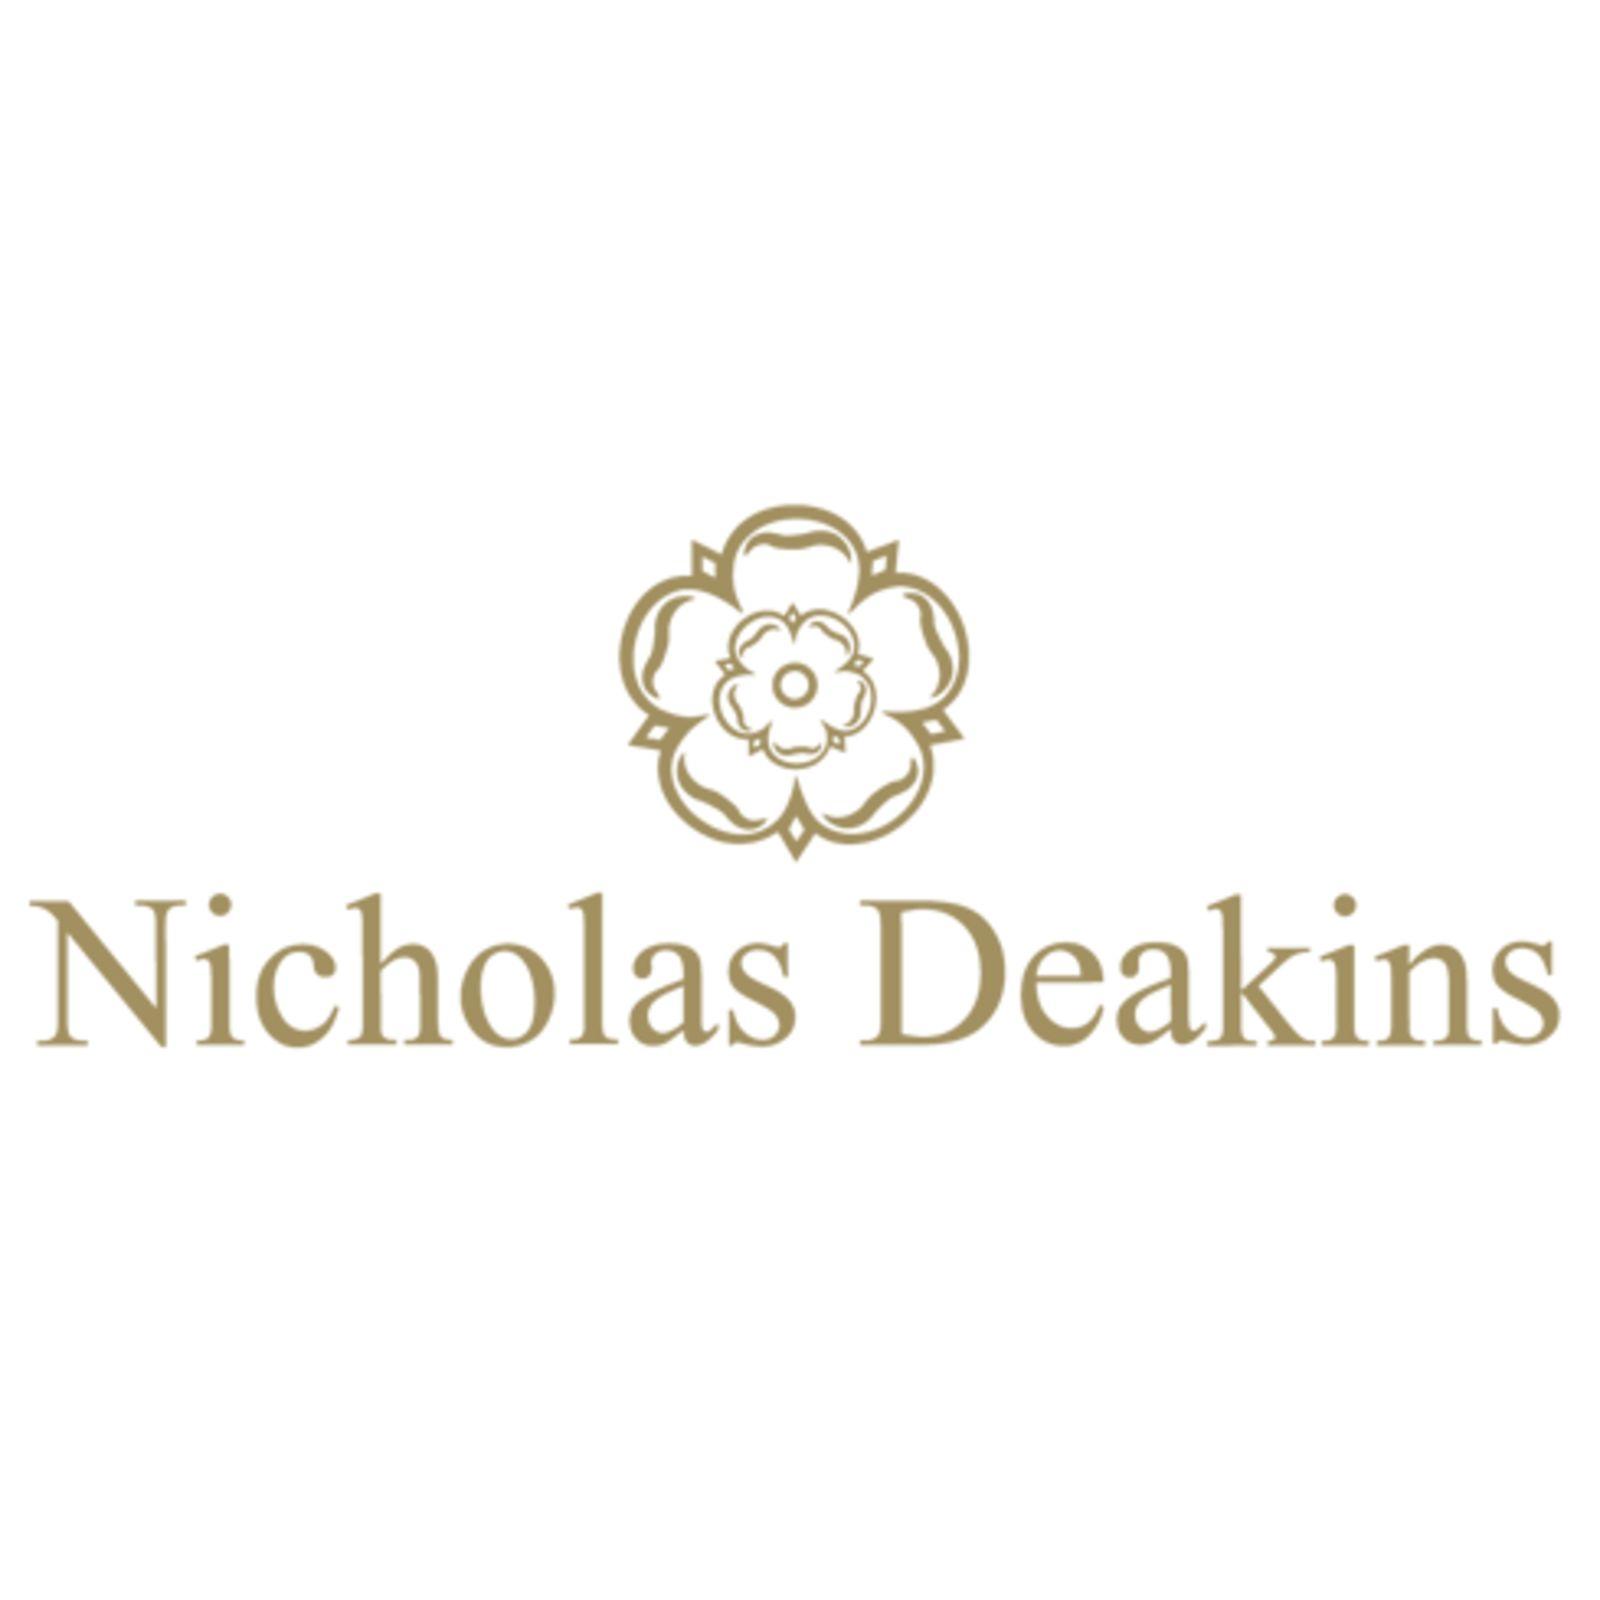 Nicholas Deakins